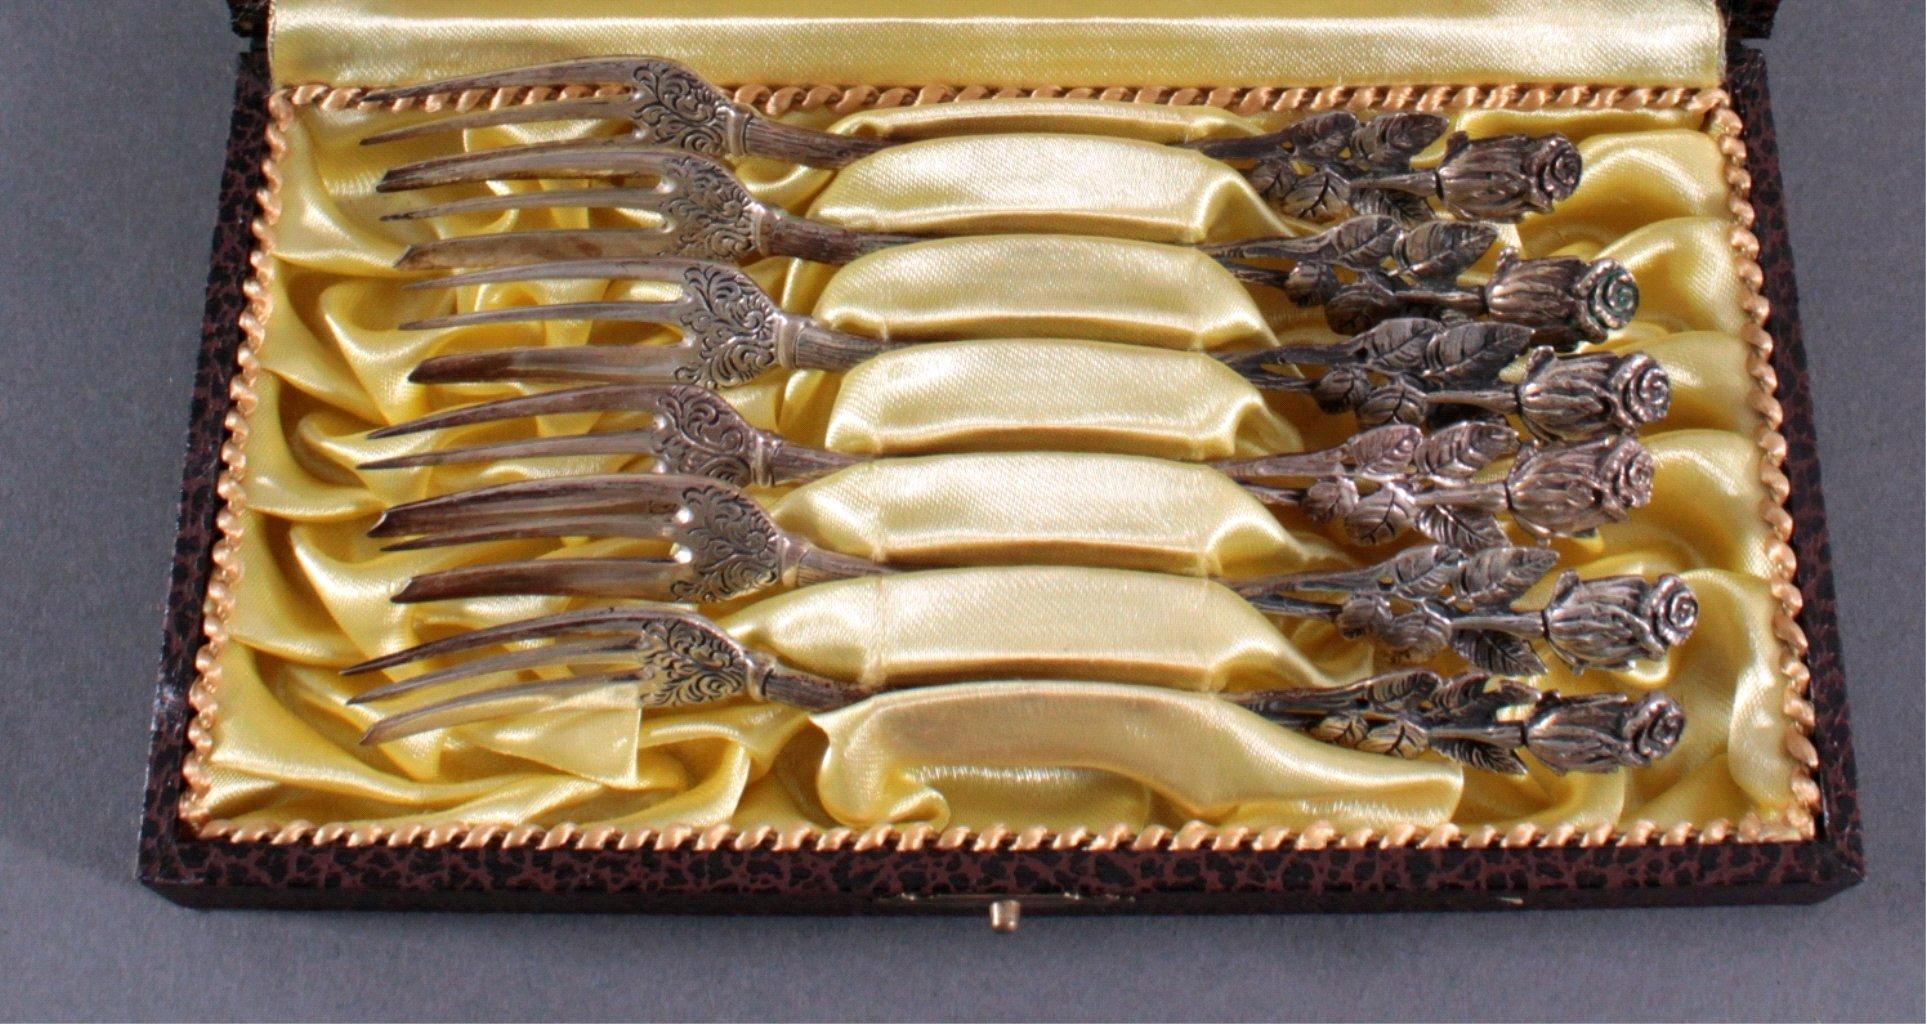 Hildesheimer Rose Kuchengabel, 800er Silber-1